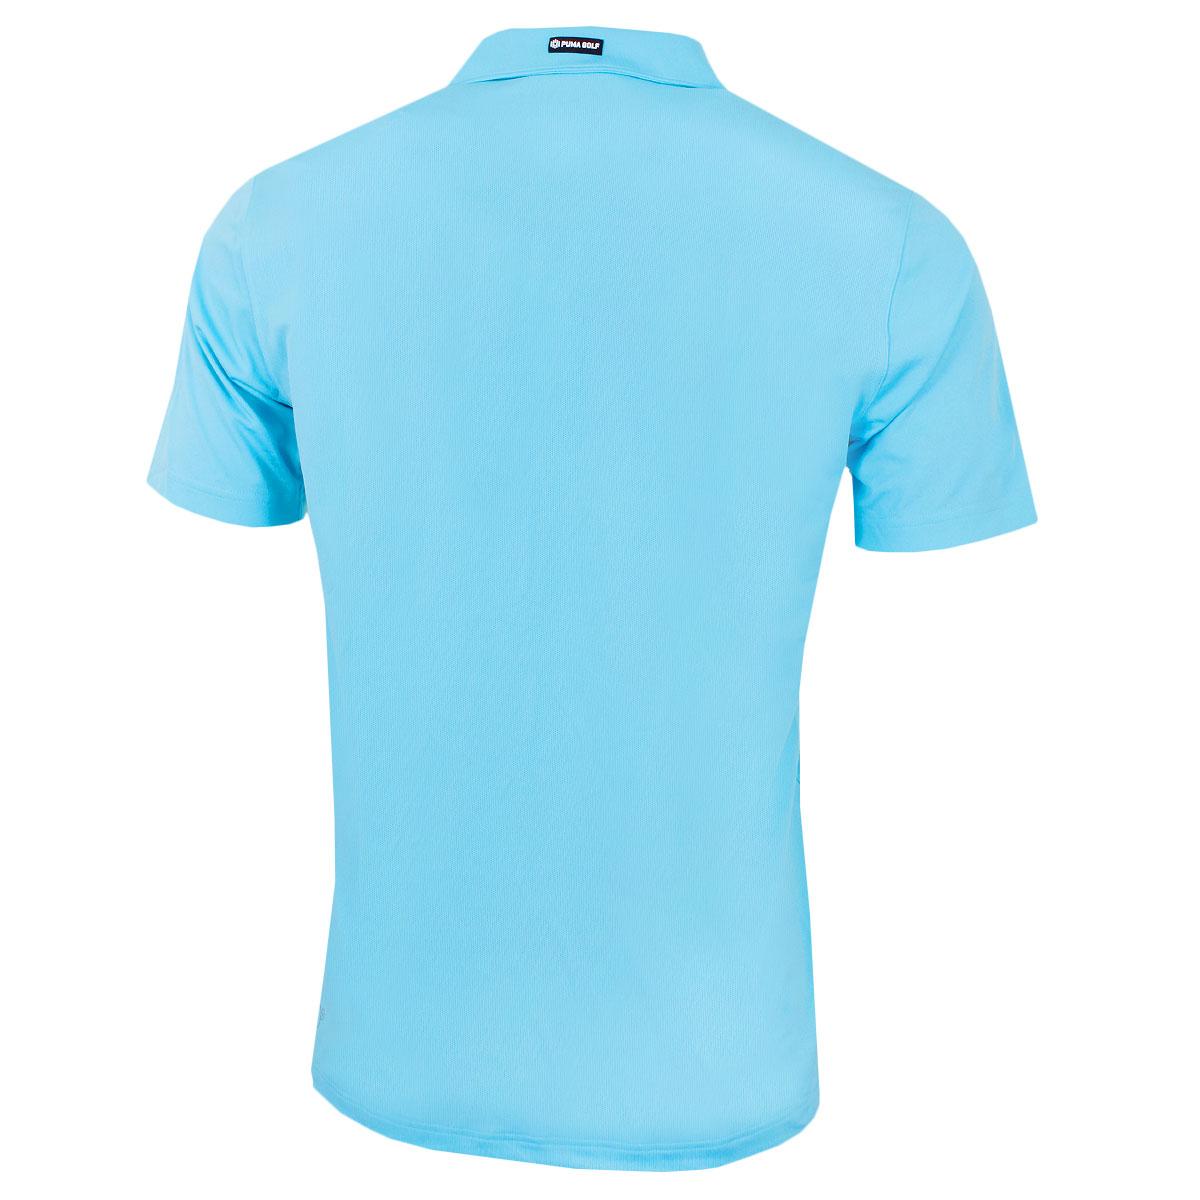 Puma-Golf-Mens-Essential-Pounce-Cresting-DryCell-Tech-Polo-Shirt-46-OFF-RRP thumbnail 22